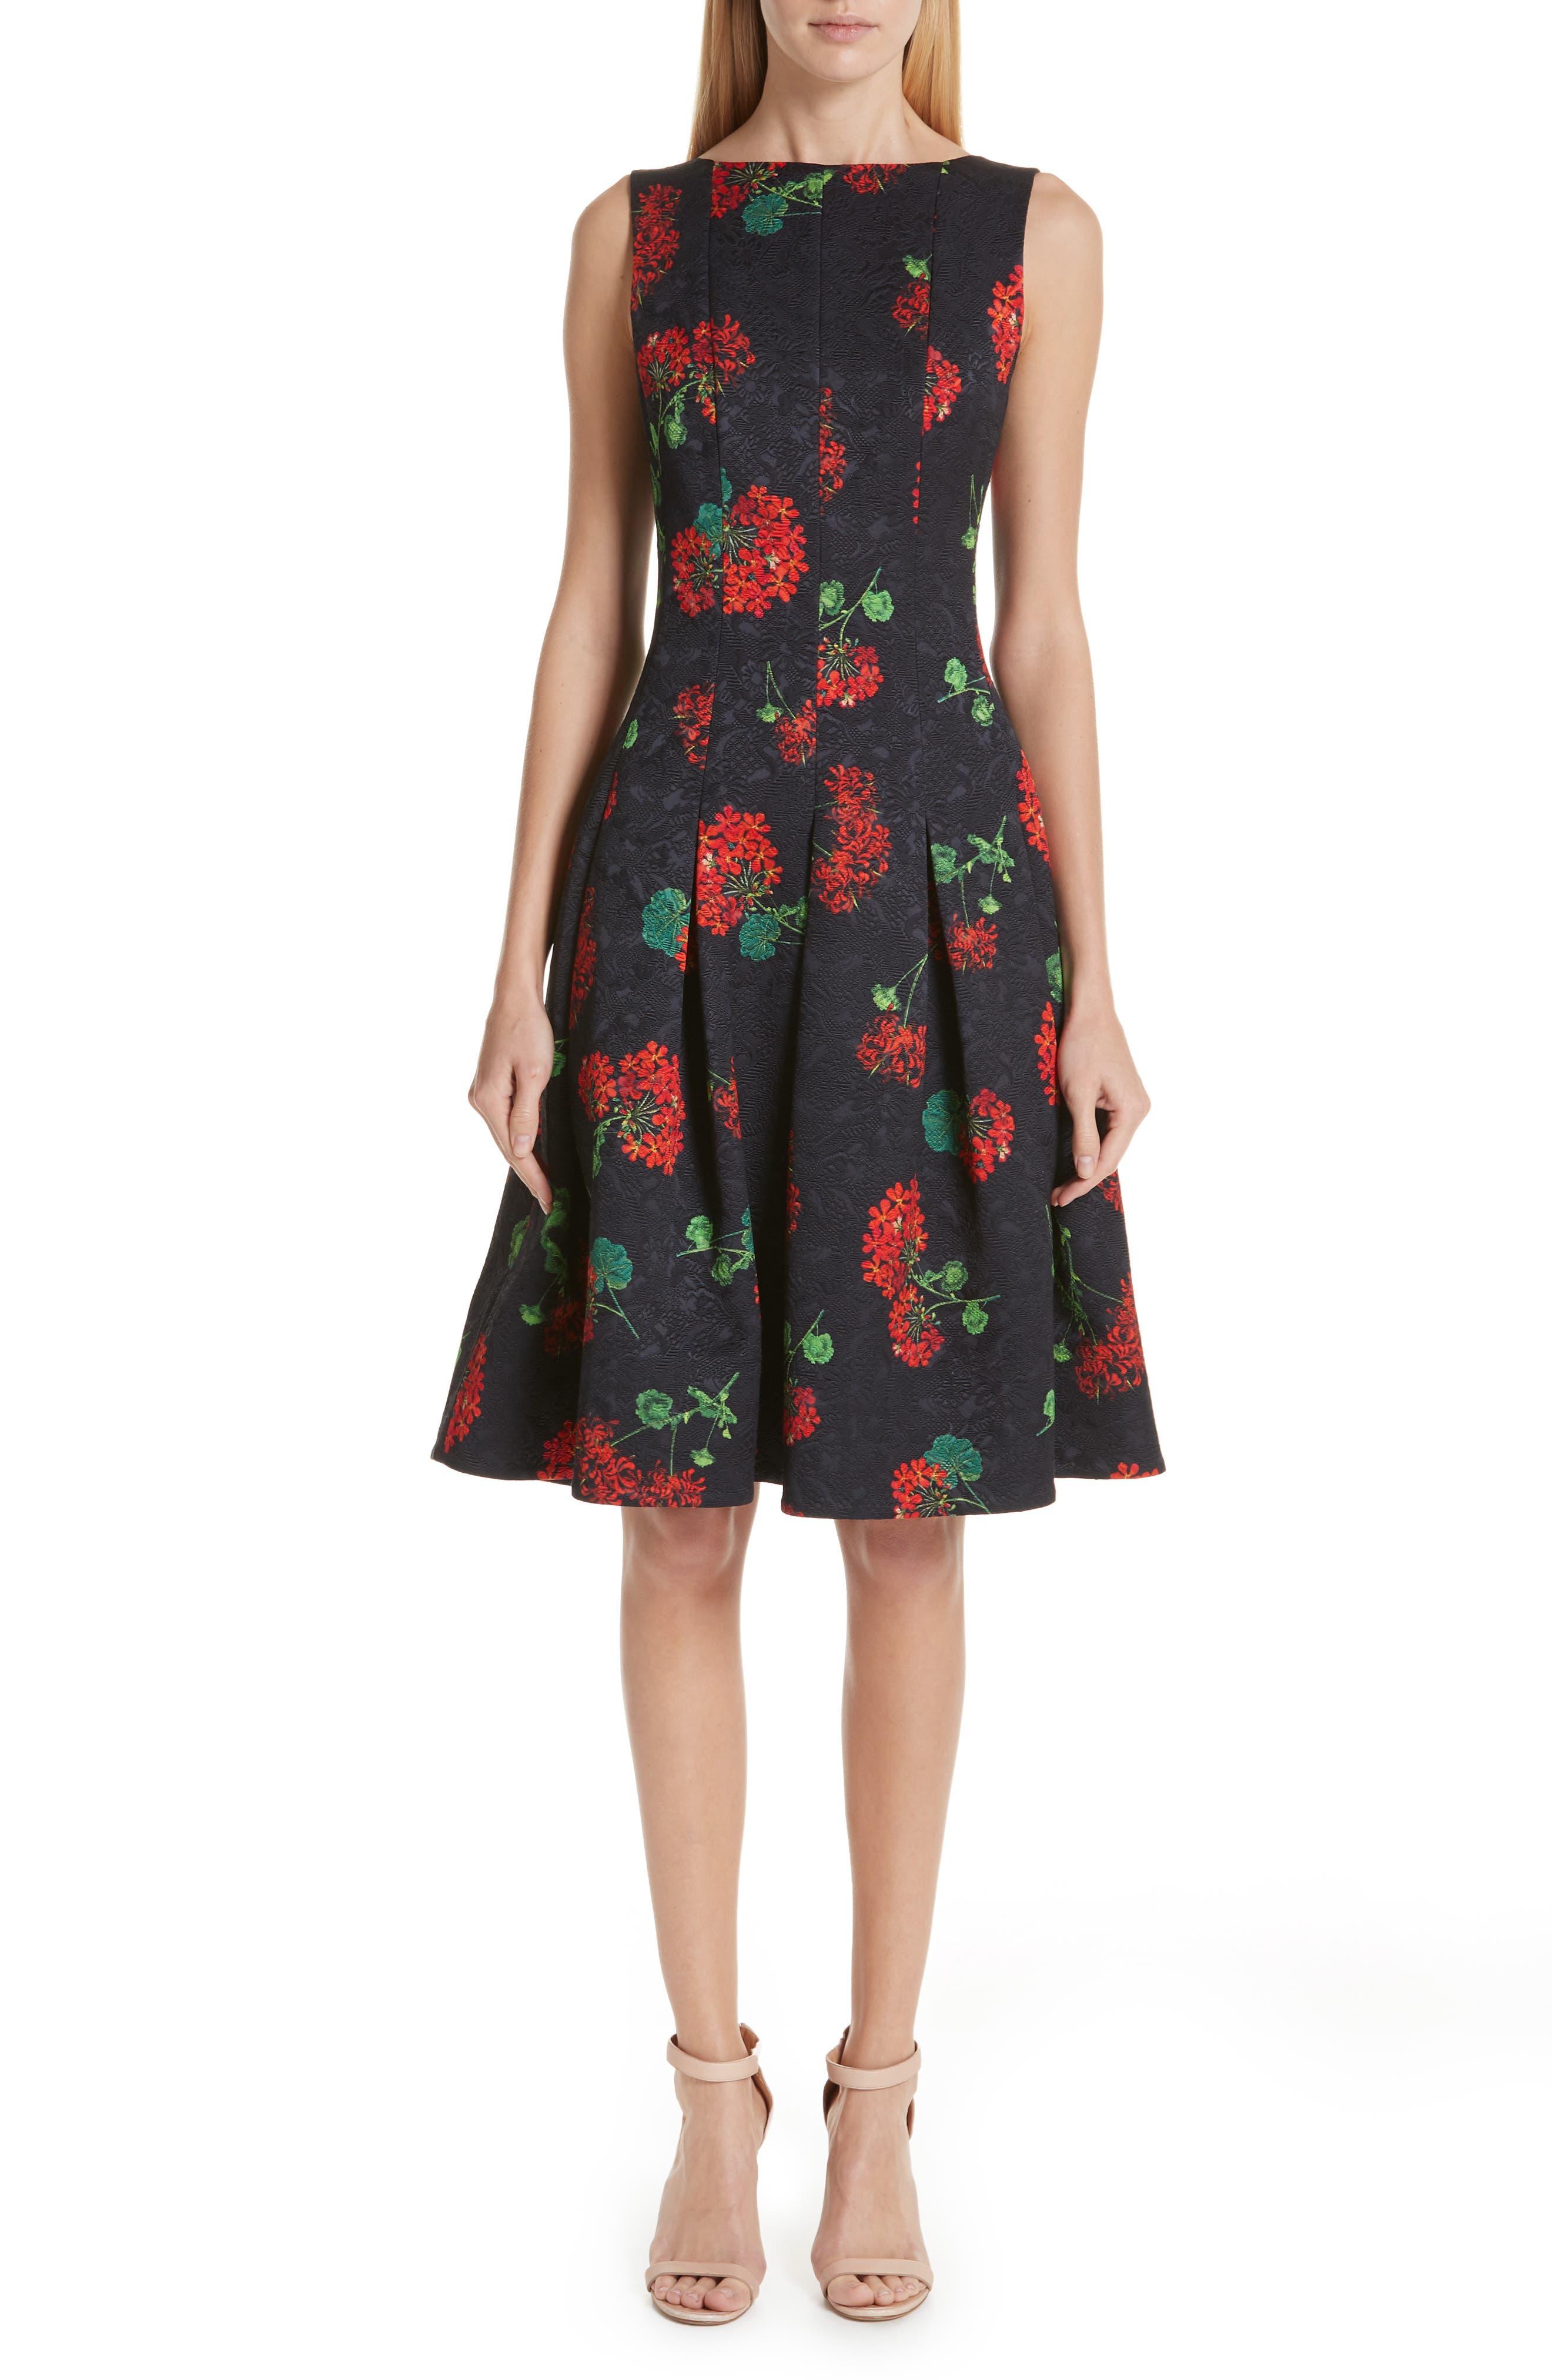 Oscar De La Renta Floral Jacquard A-Line Dress, Black